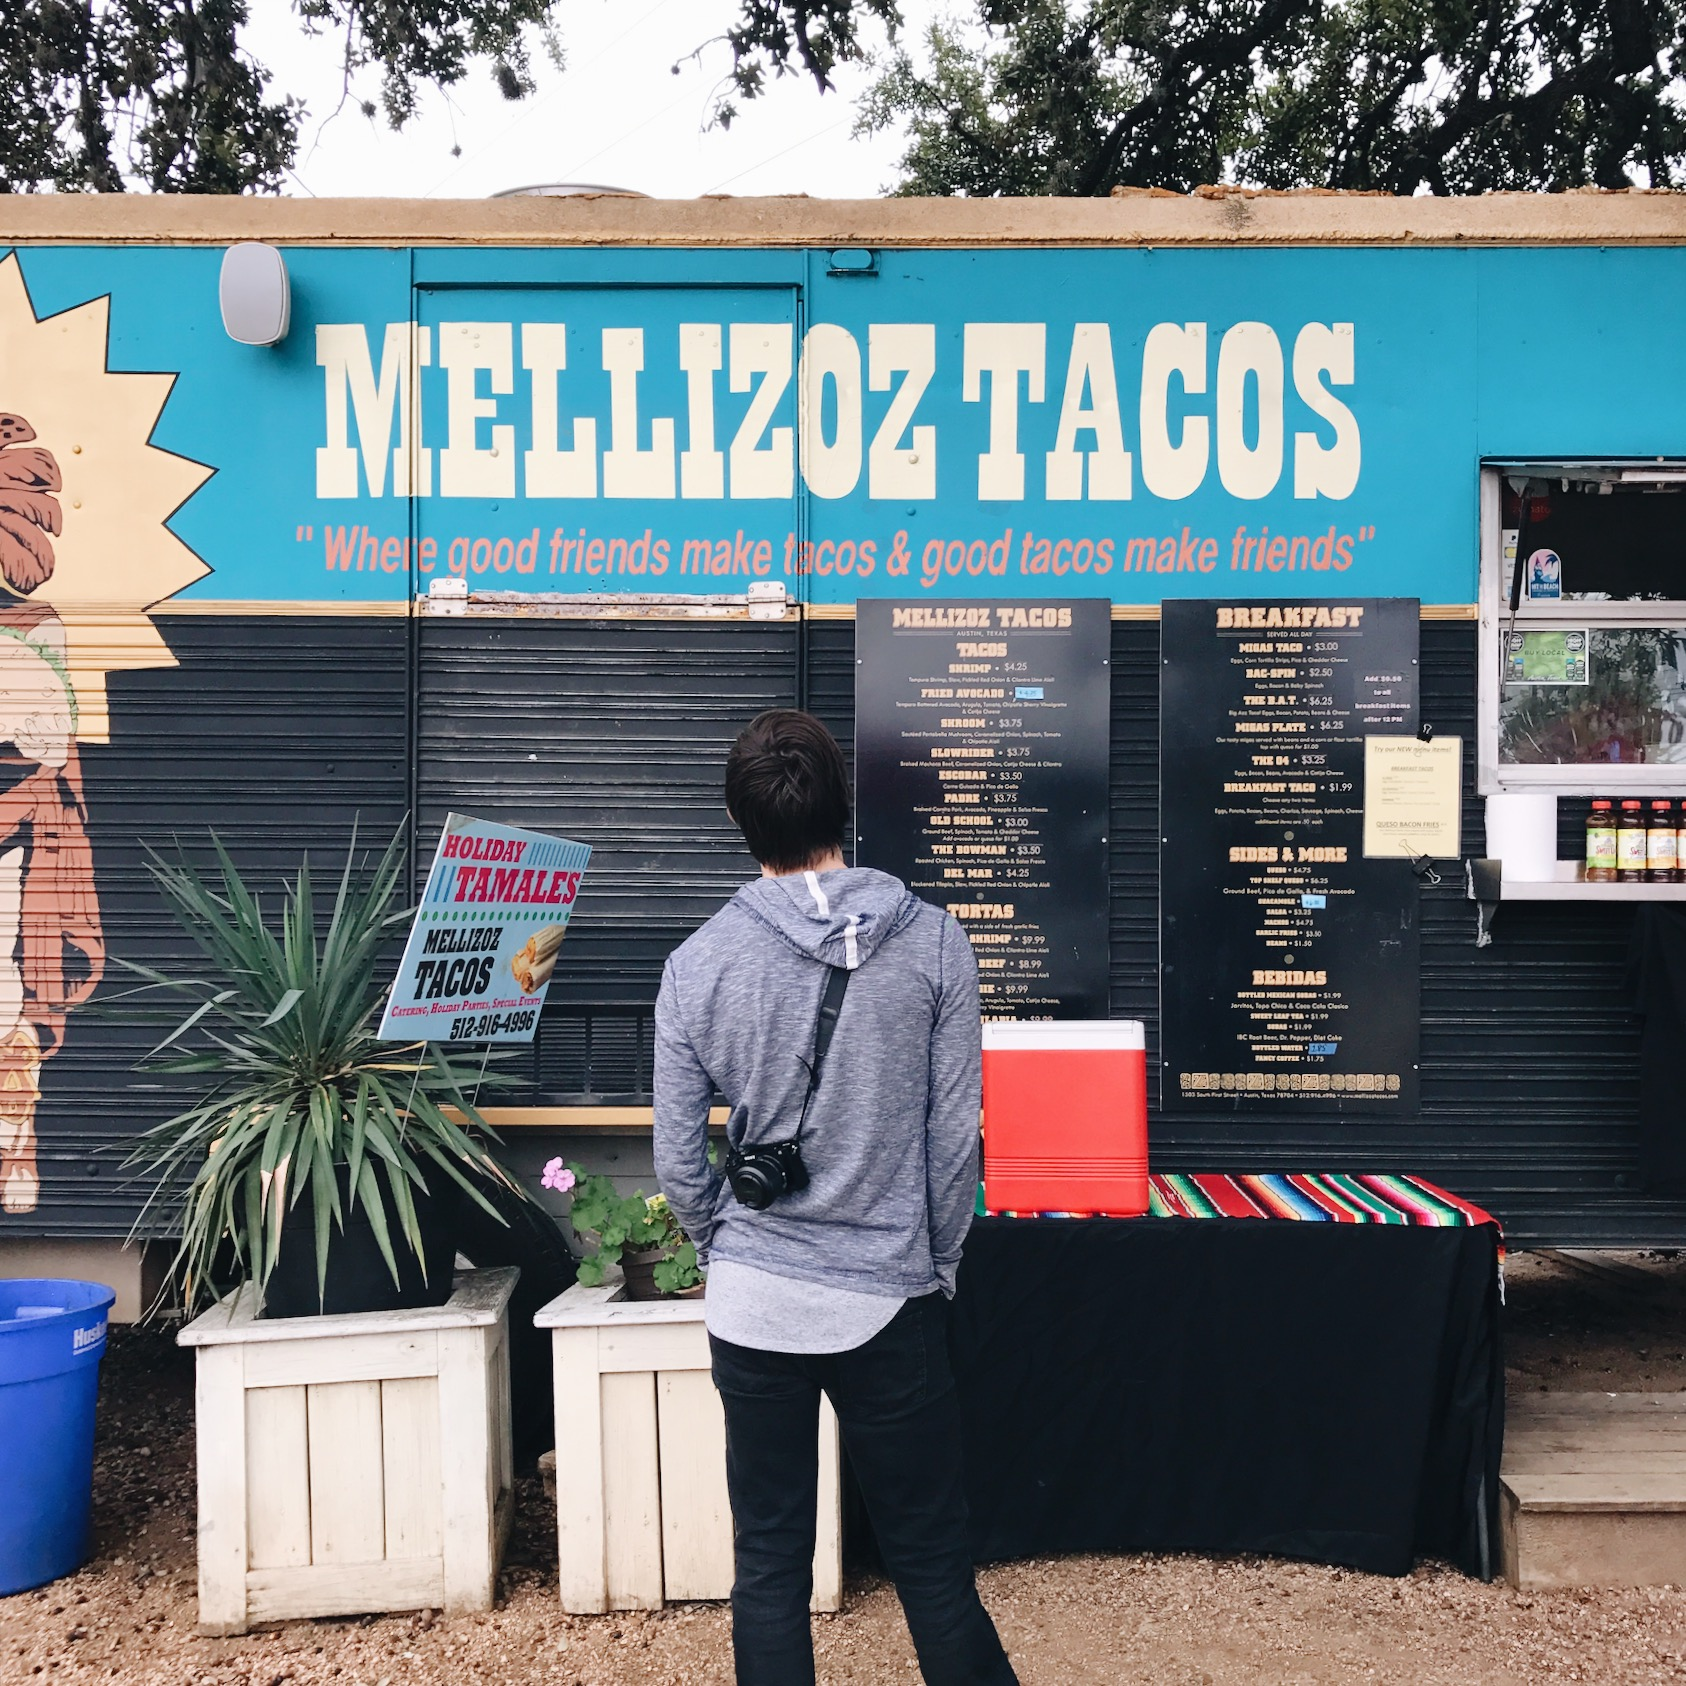 mellizoz_tacos_atx